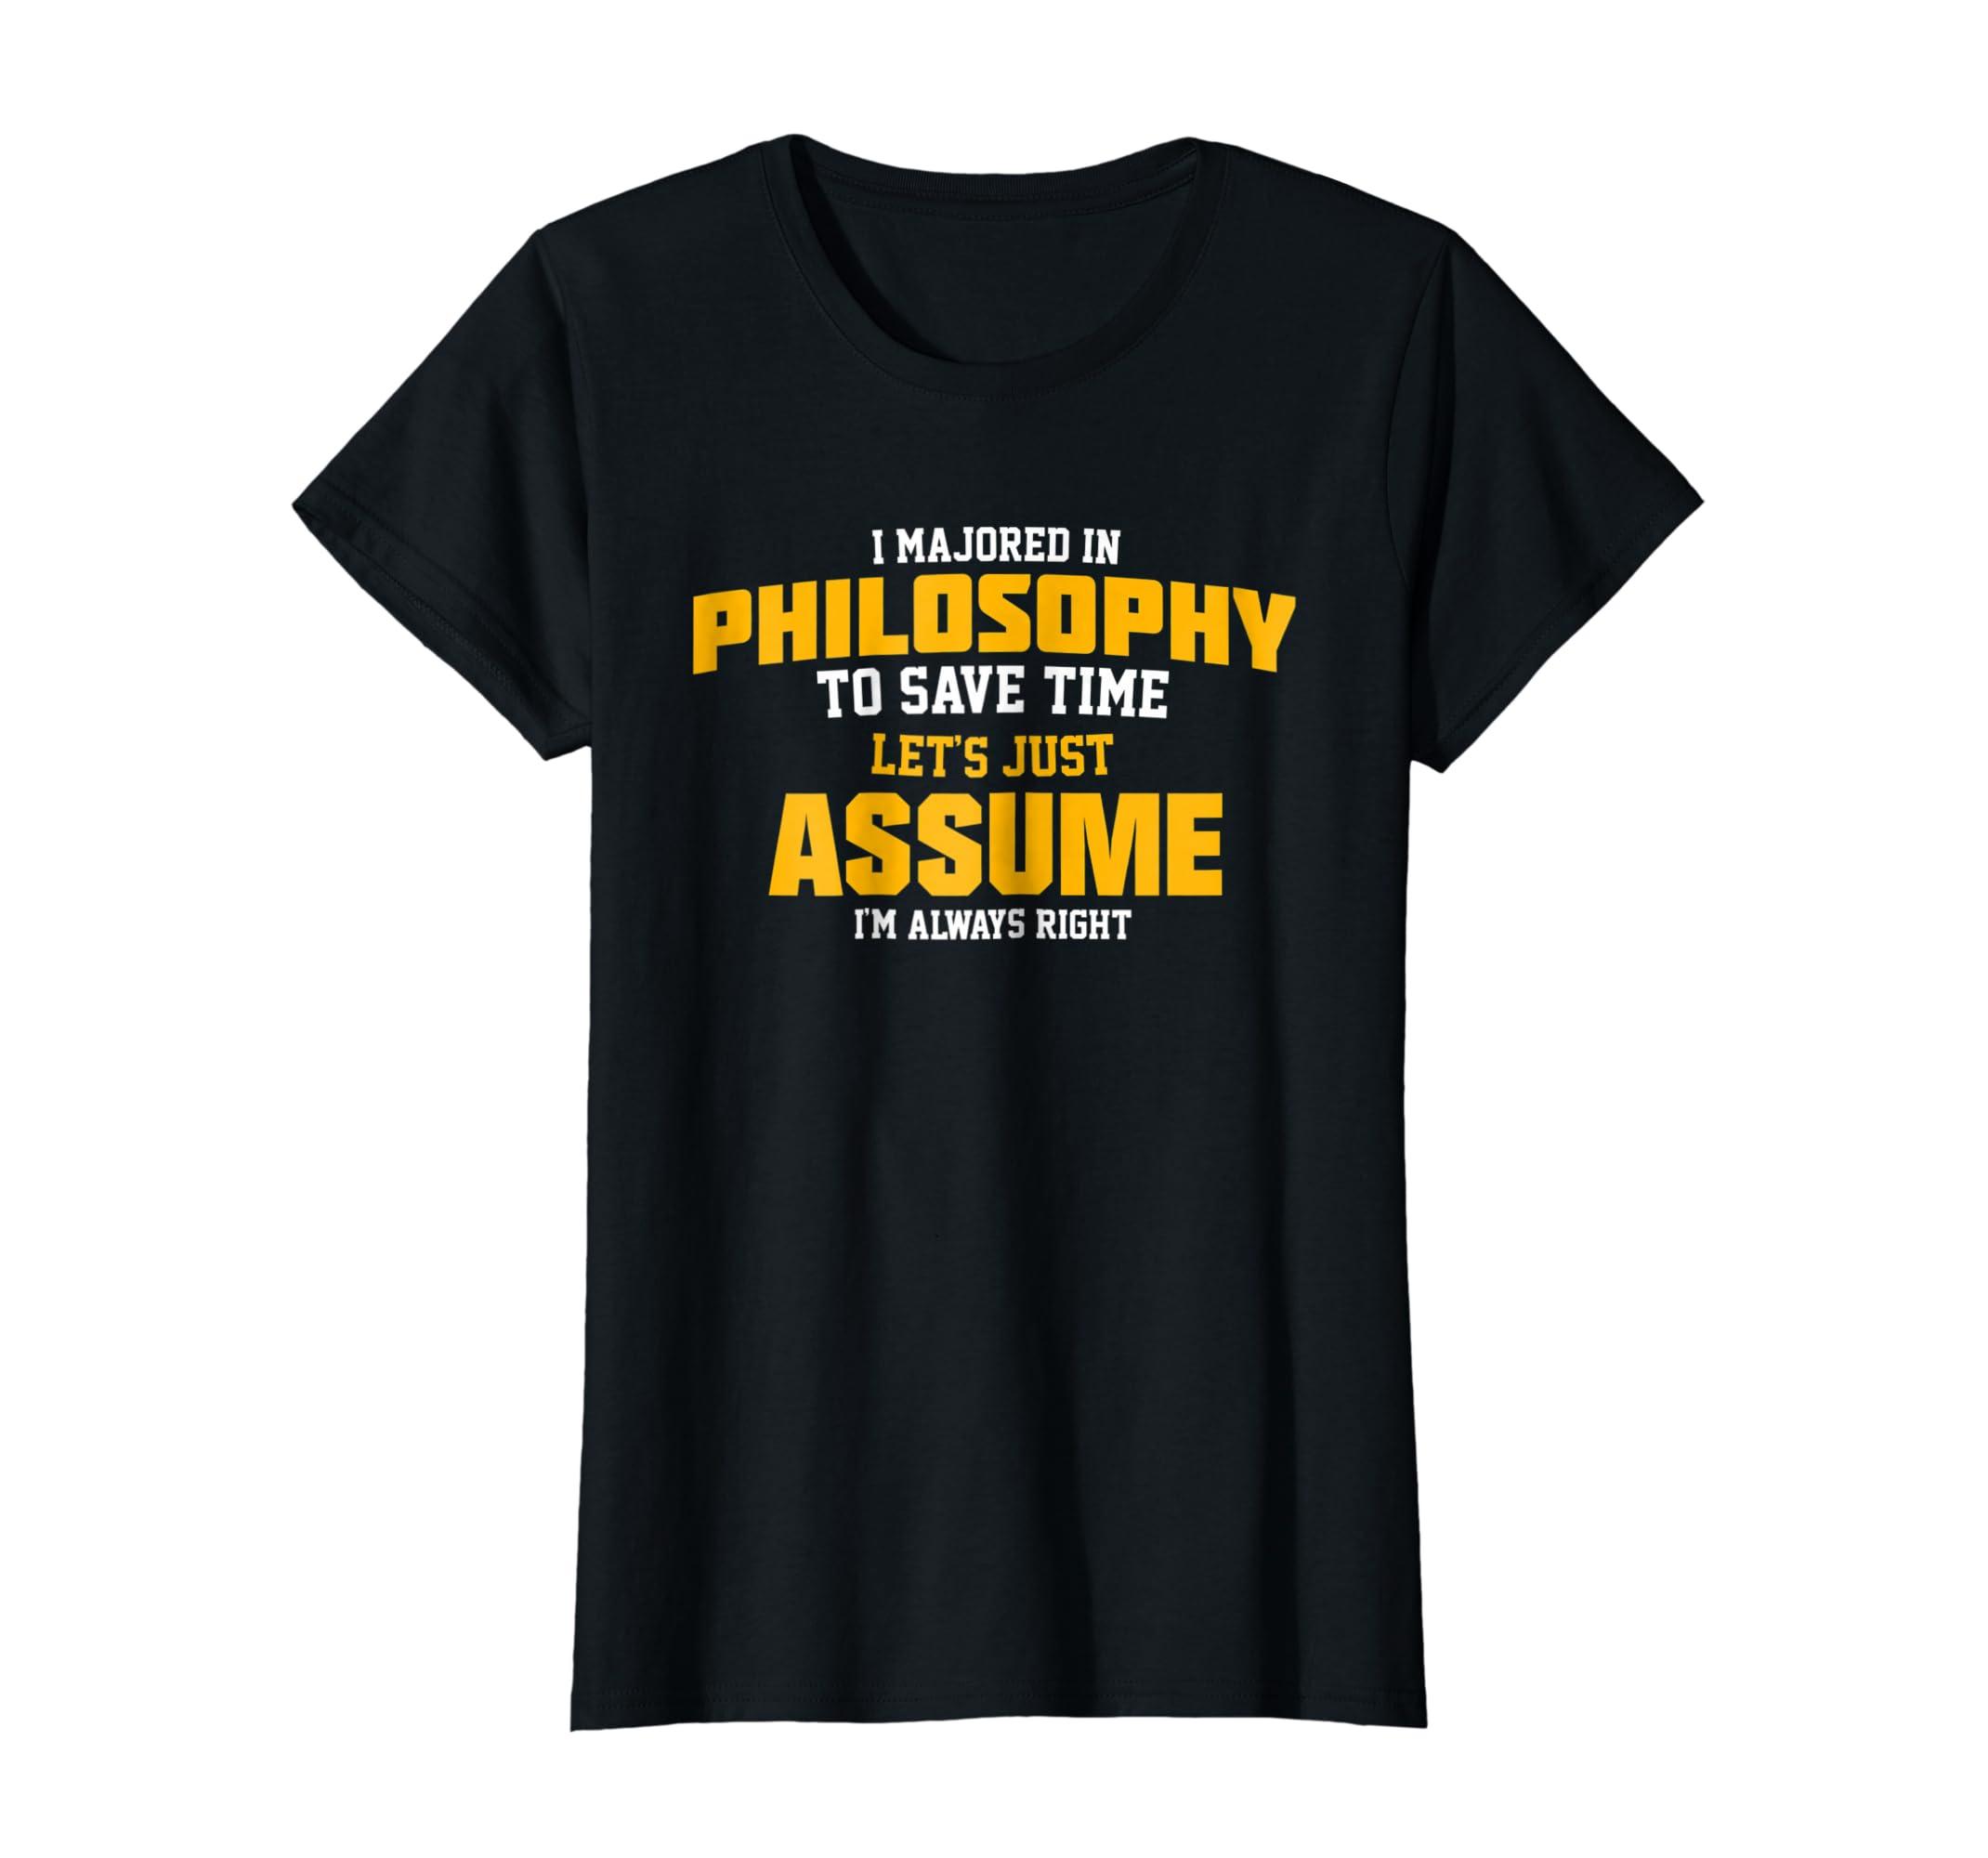 641813c7 Amazon.com: Philosophy Major T-Shirt Let's Assume I'm Always Right Tee:  Clothing